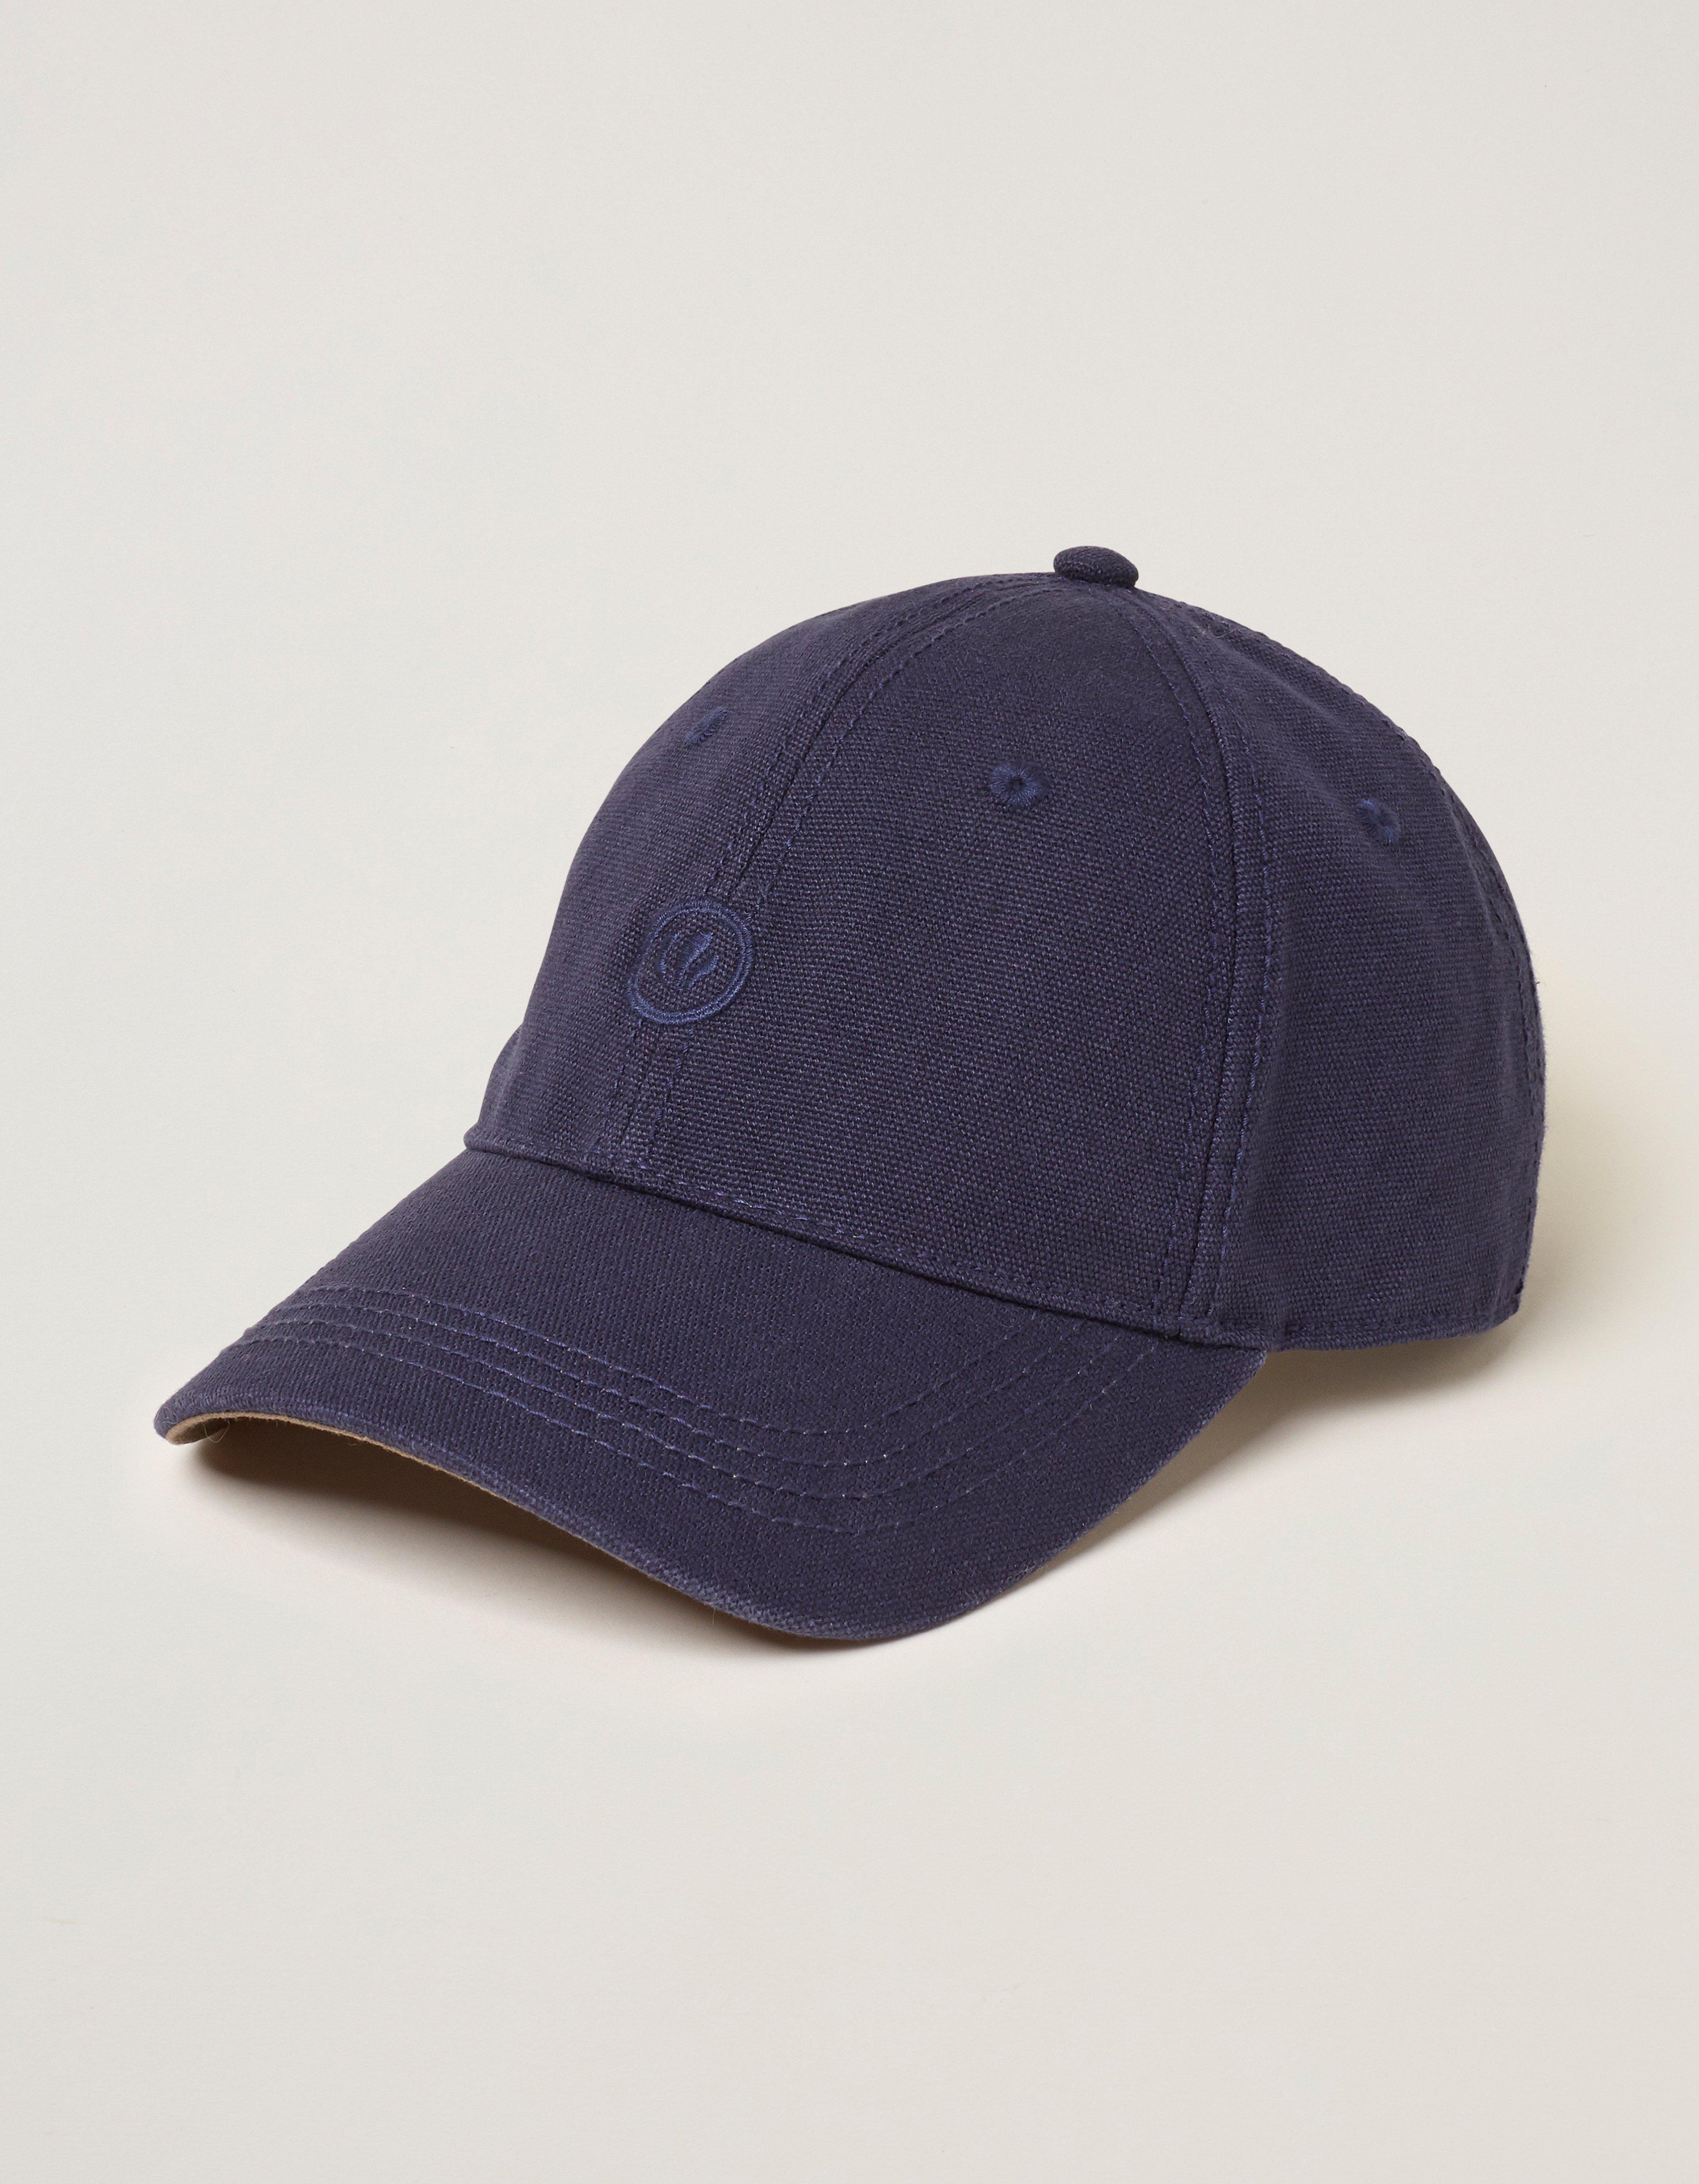 Fat Face Plain Baseball Cap  - Size: One Size